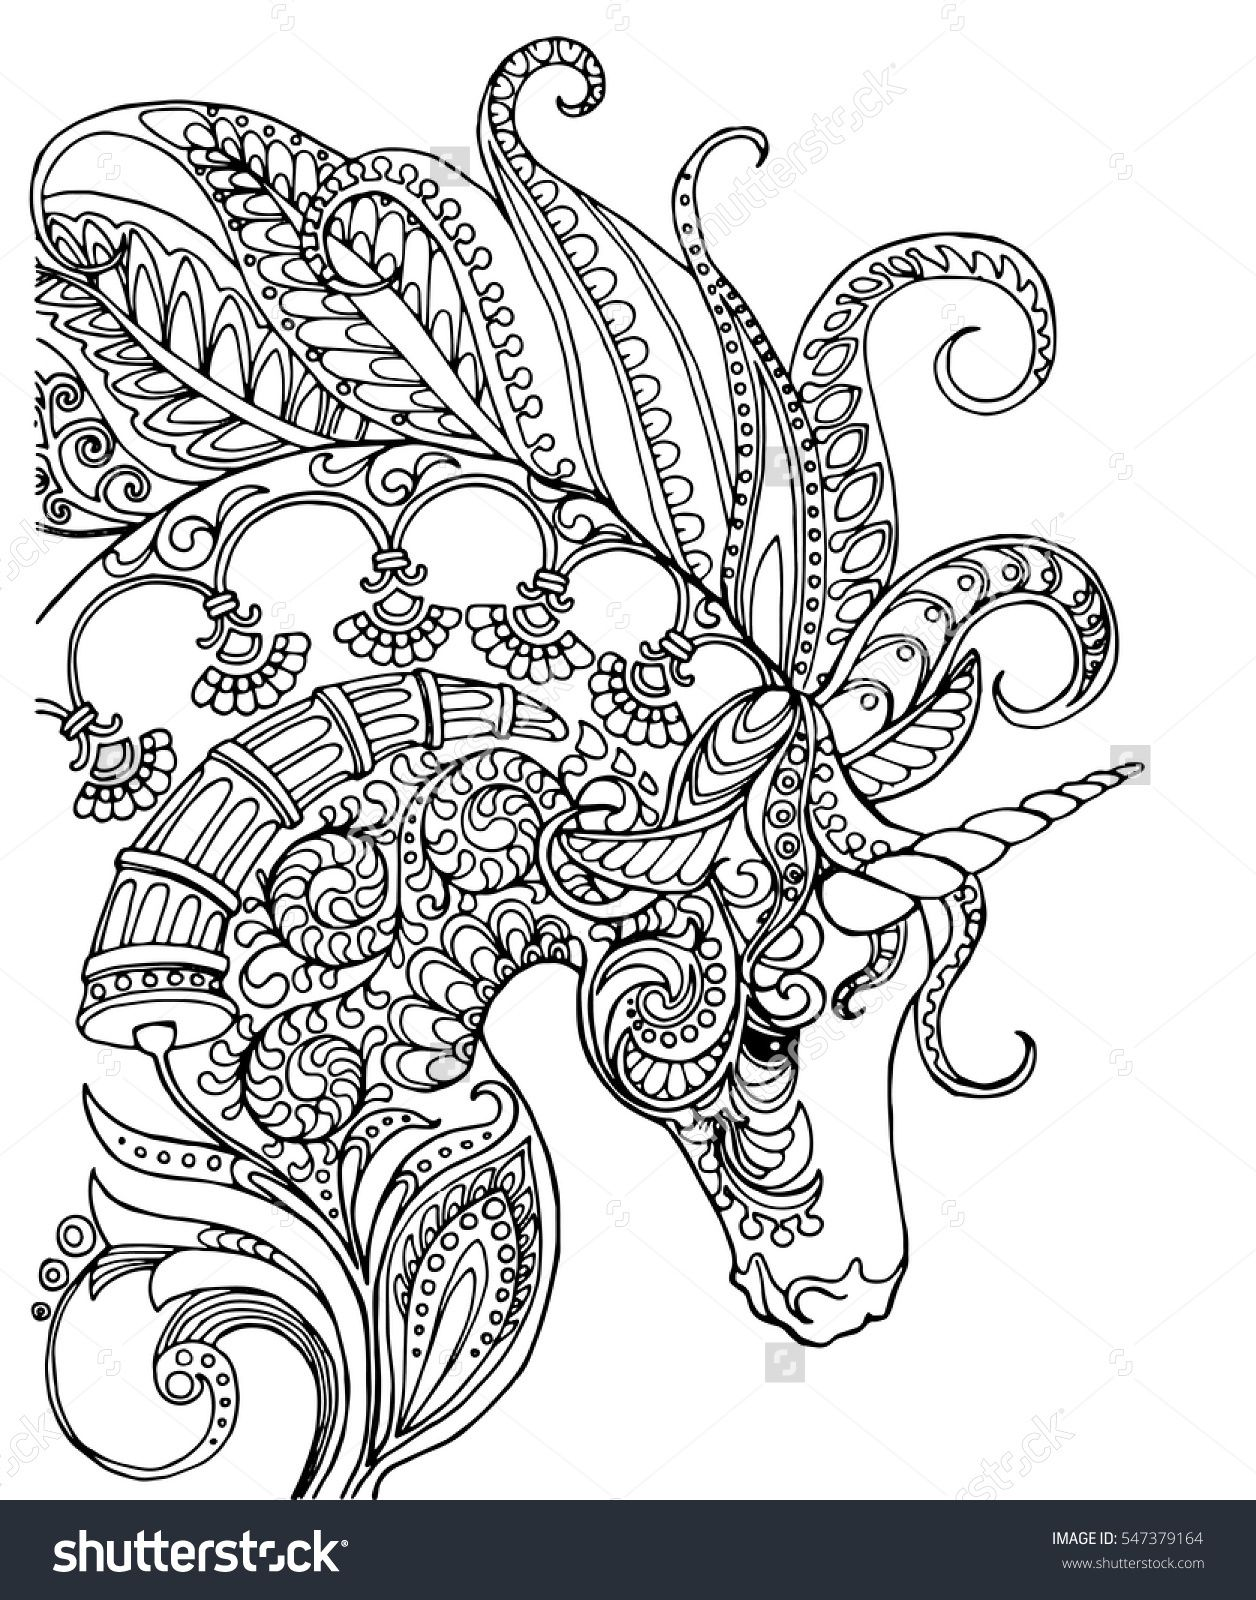 Elegant Zentangle Patterned Unicorn Doodle Page For Adult Colouring Book Vector Design